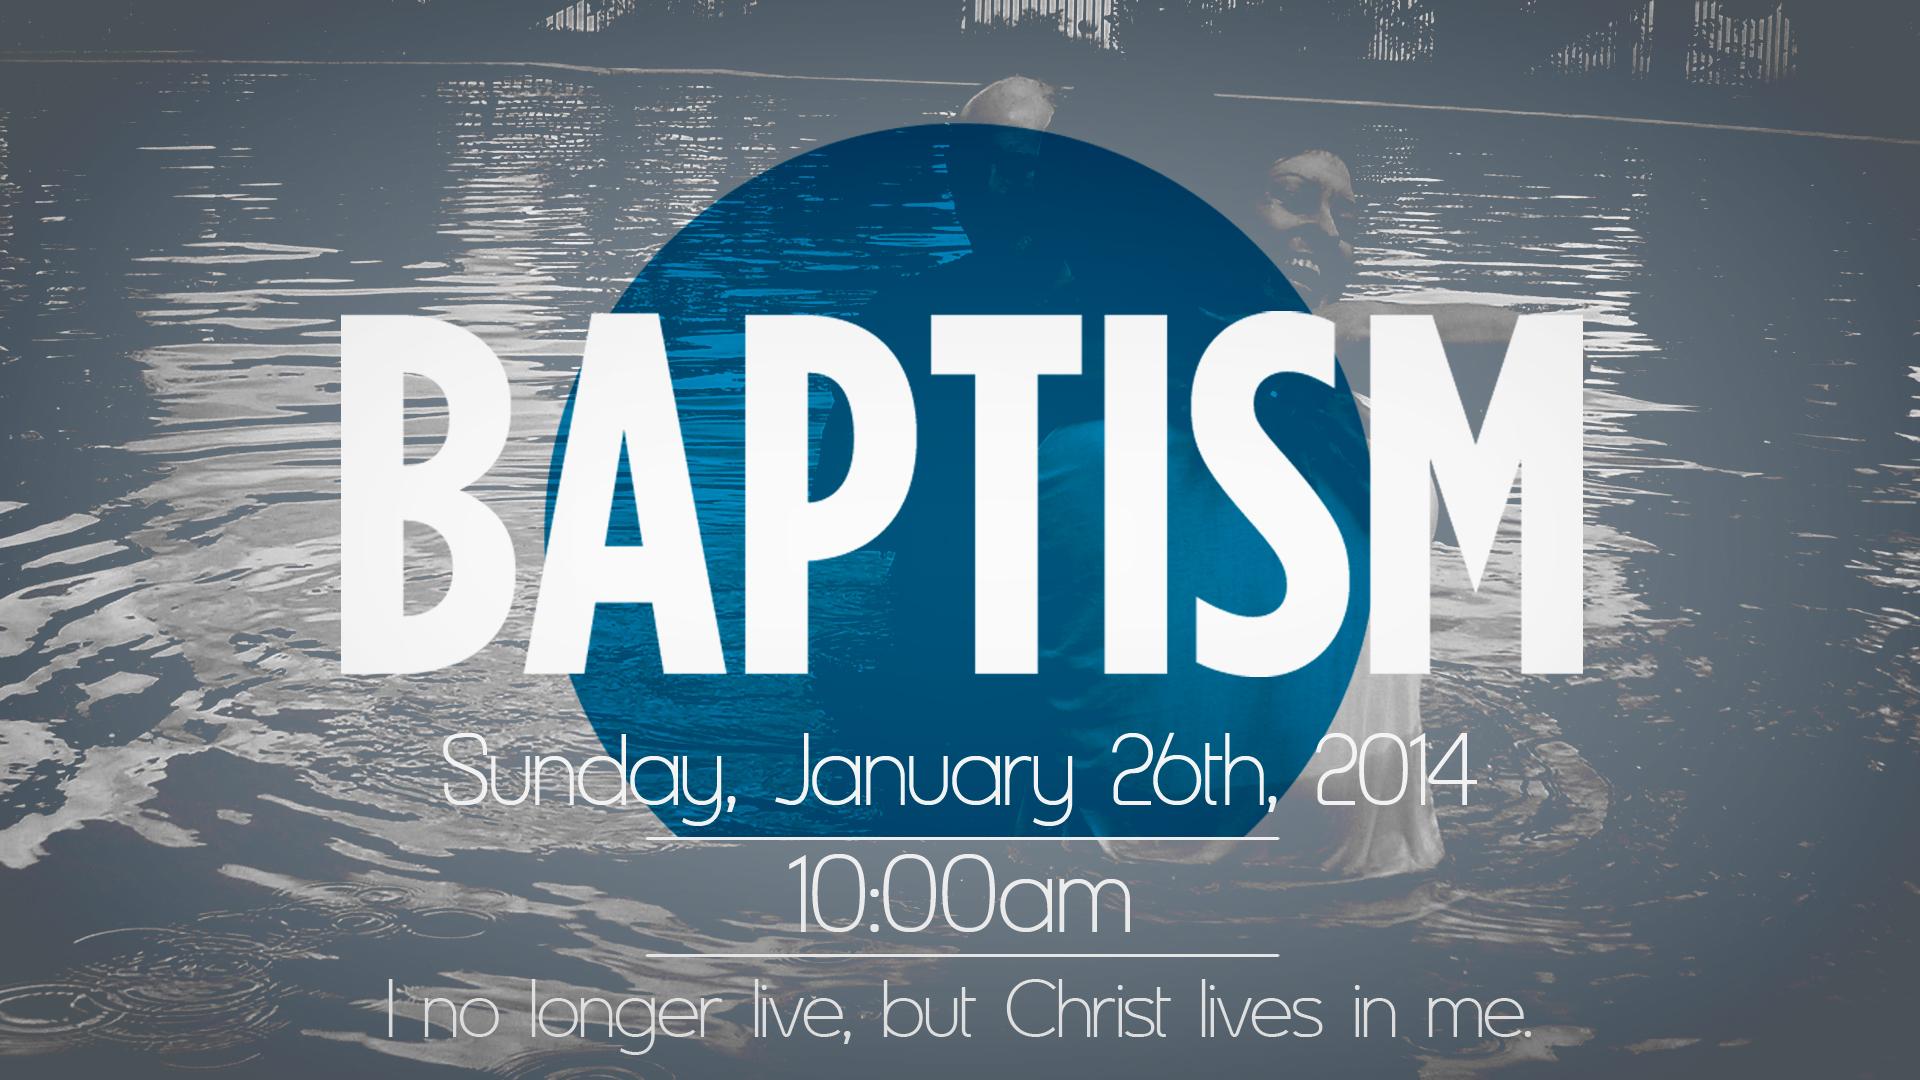 Baptisms on January 26th!